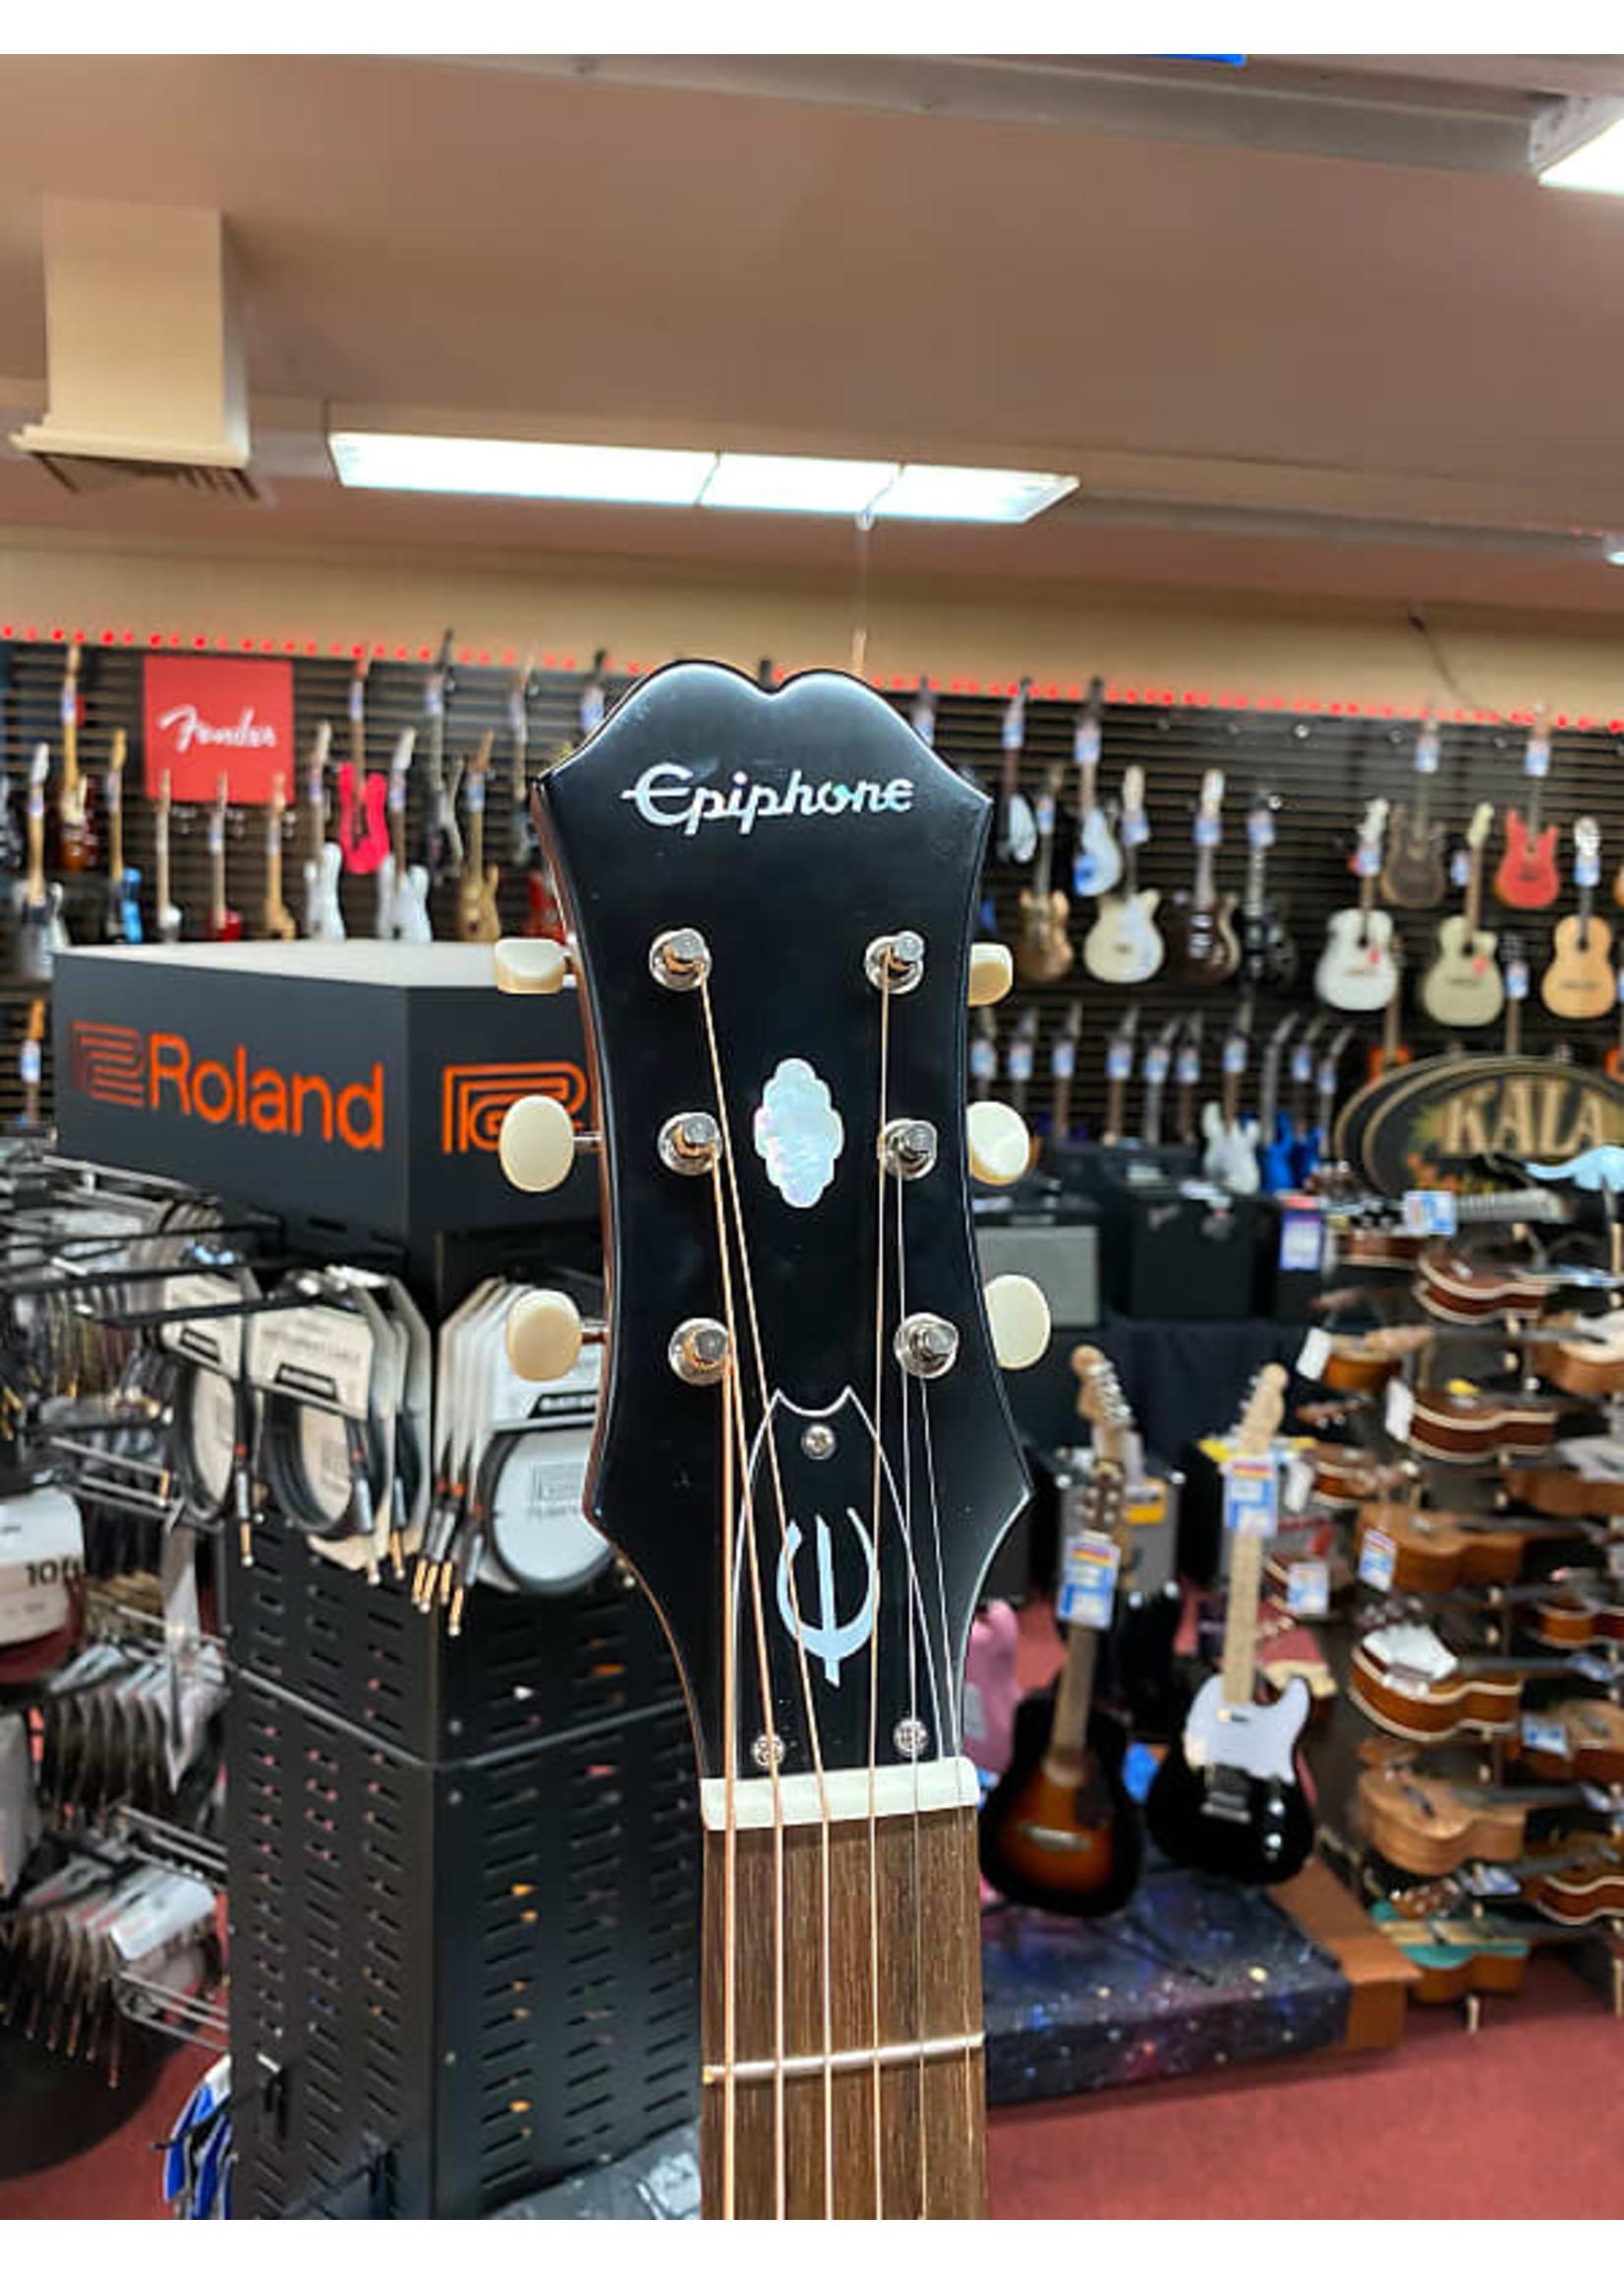 Epiphone Epiphone Masterbilt Texan Acoustic-Electric Guitar - Antique Natural Aged Gloss